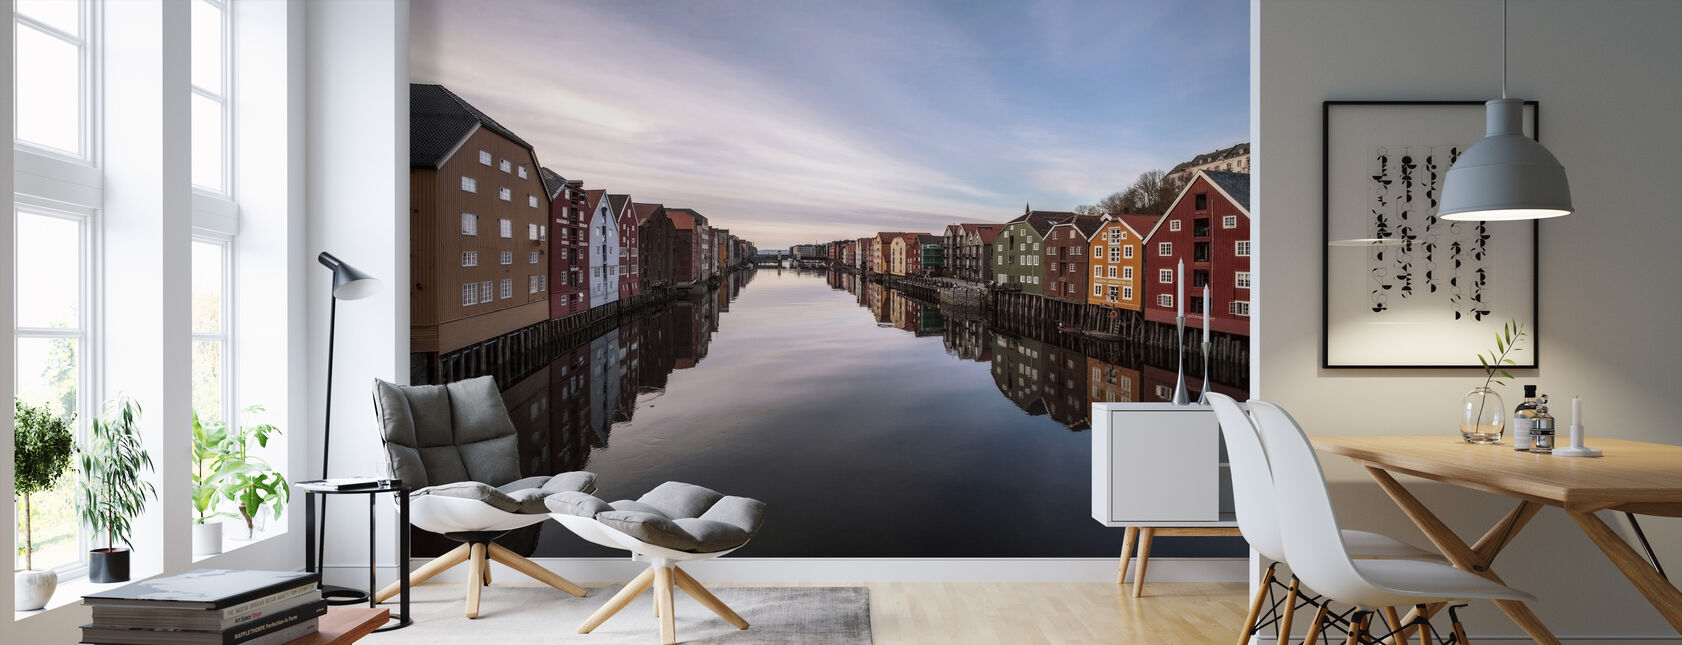 Trondheim, Norge - Tapet - Stue